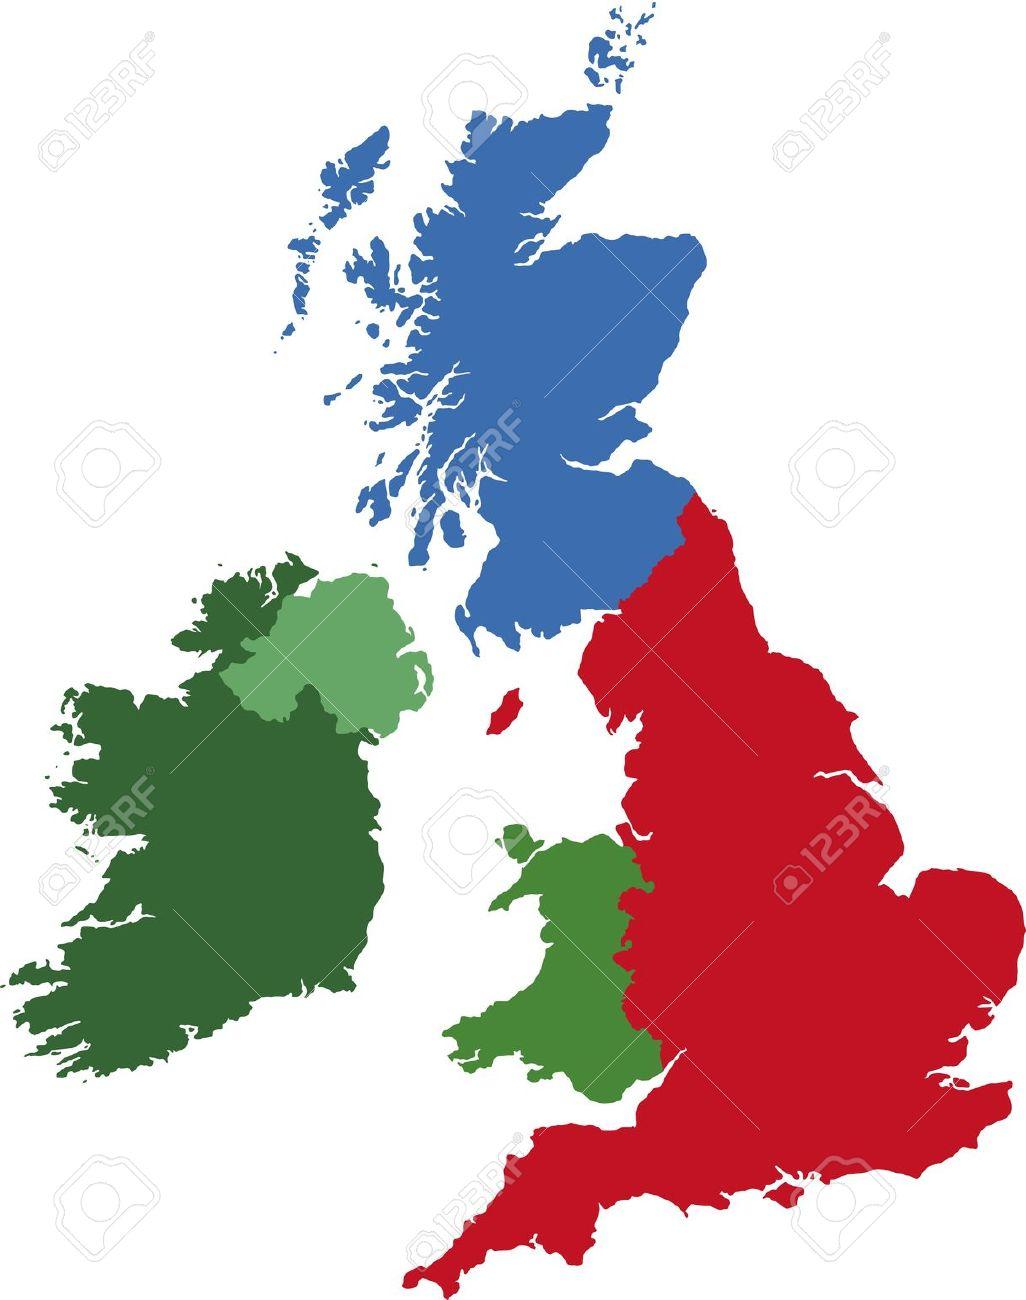 United Kingdom clipart England Clipart Collections United kingdom ClipartFest BBCpersian7